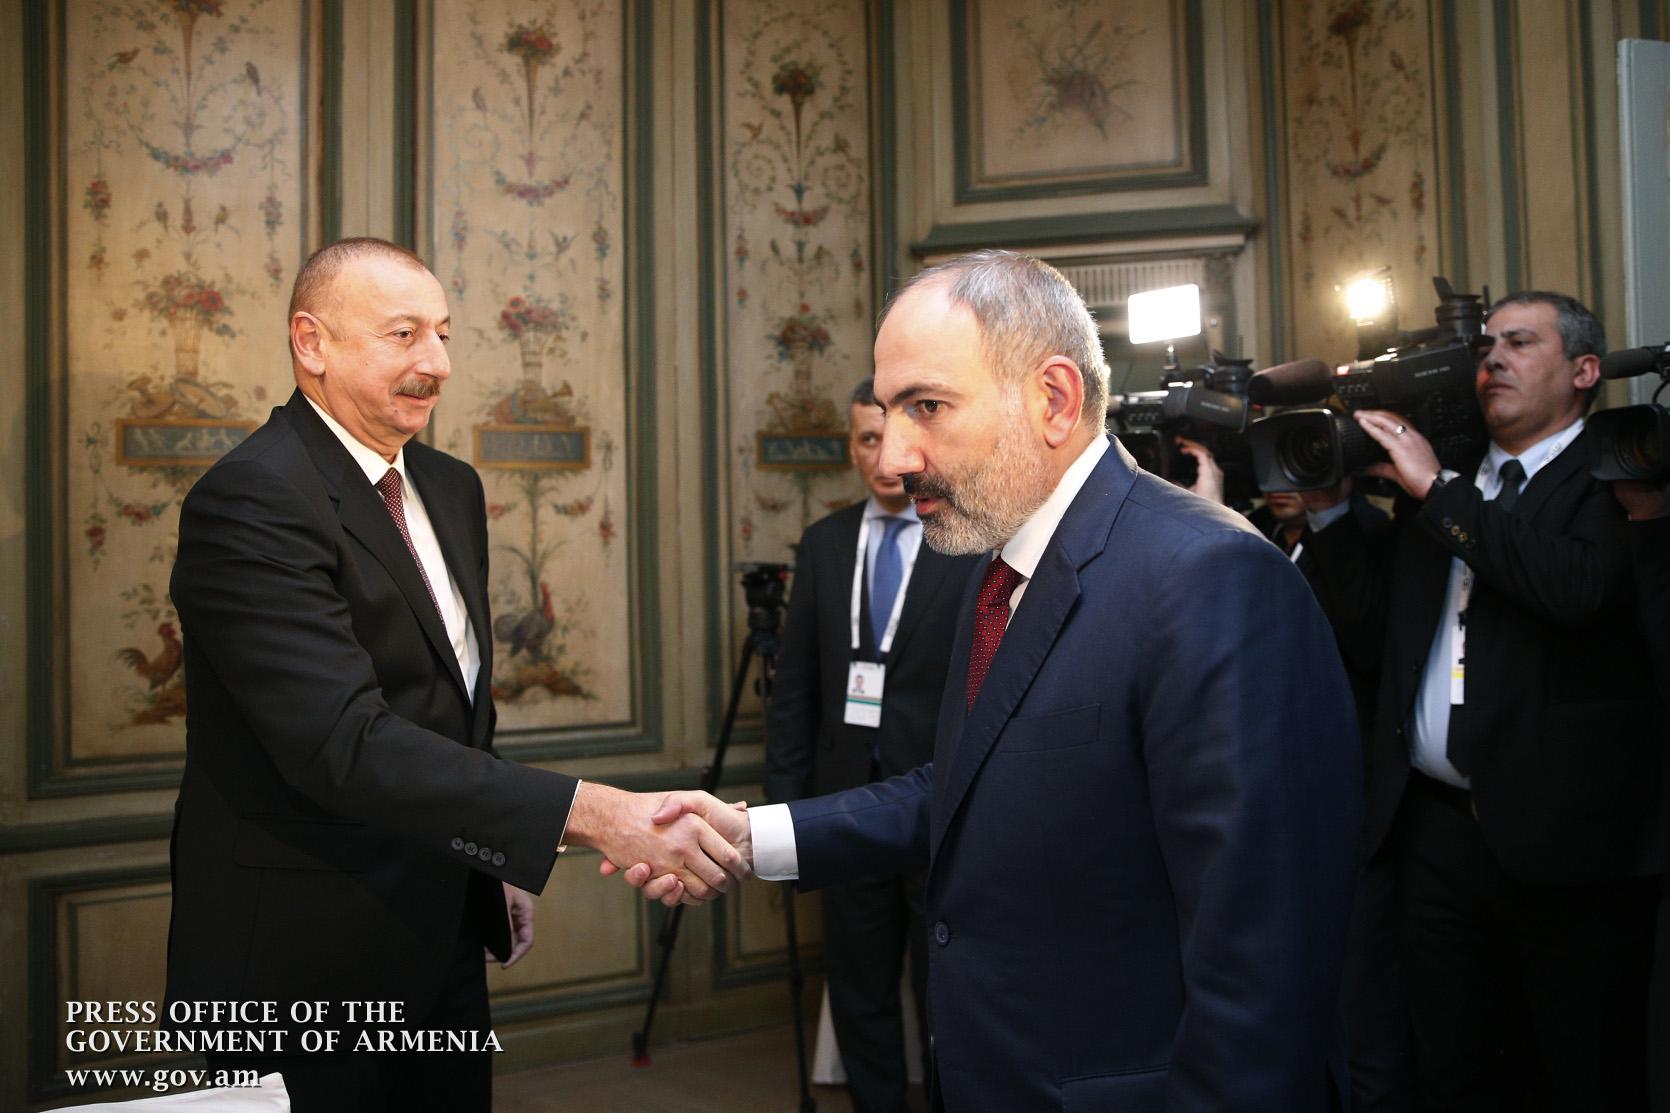 Photo of Հիմա պարզ է՞, թե ինչու՞ է Ալիևը կապիտուլյանտին ծաղրում՝ ասելով NƏ OLDU, PAŞİNYAN? (ի՞նչ եղավ, Փաշինյան). ՀՀ ՊՆ նախկին տեղակալ